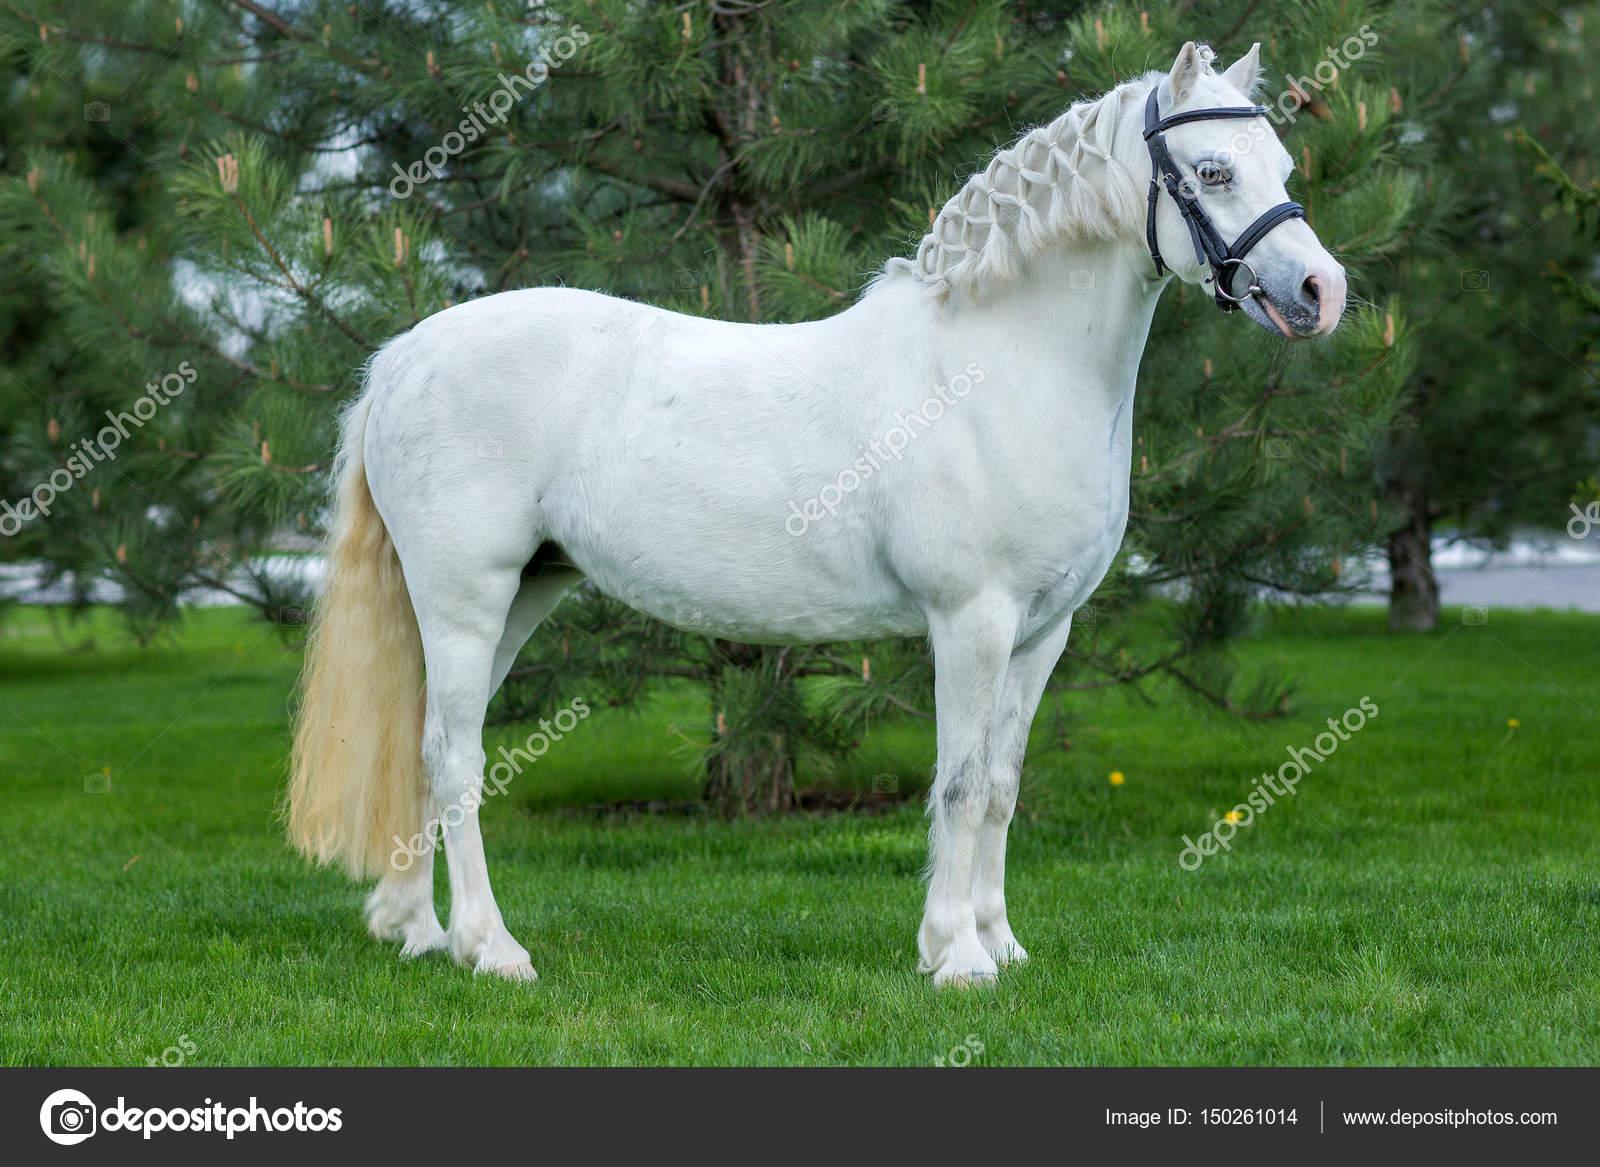 Beautiful White Horse Portrait At The Pasture Agaist Greenery Stock Photo C Sichkarenko Com 150261014